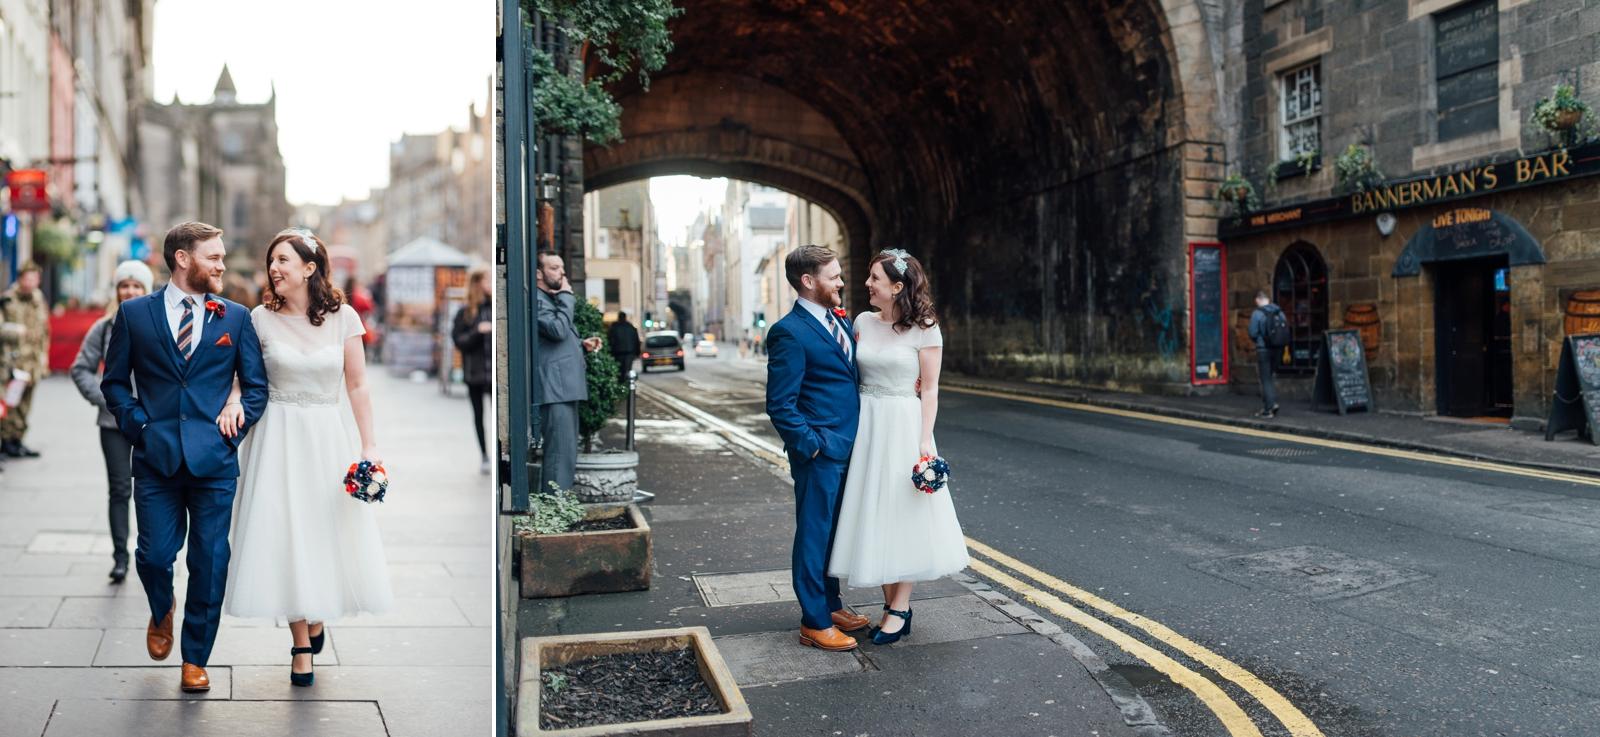 thecaves_retro_DIY_wedding_00081.jpg